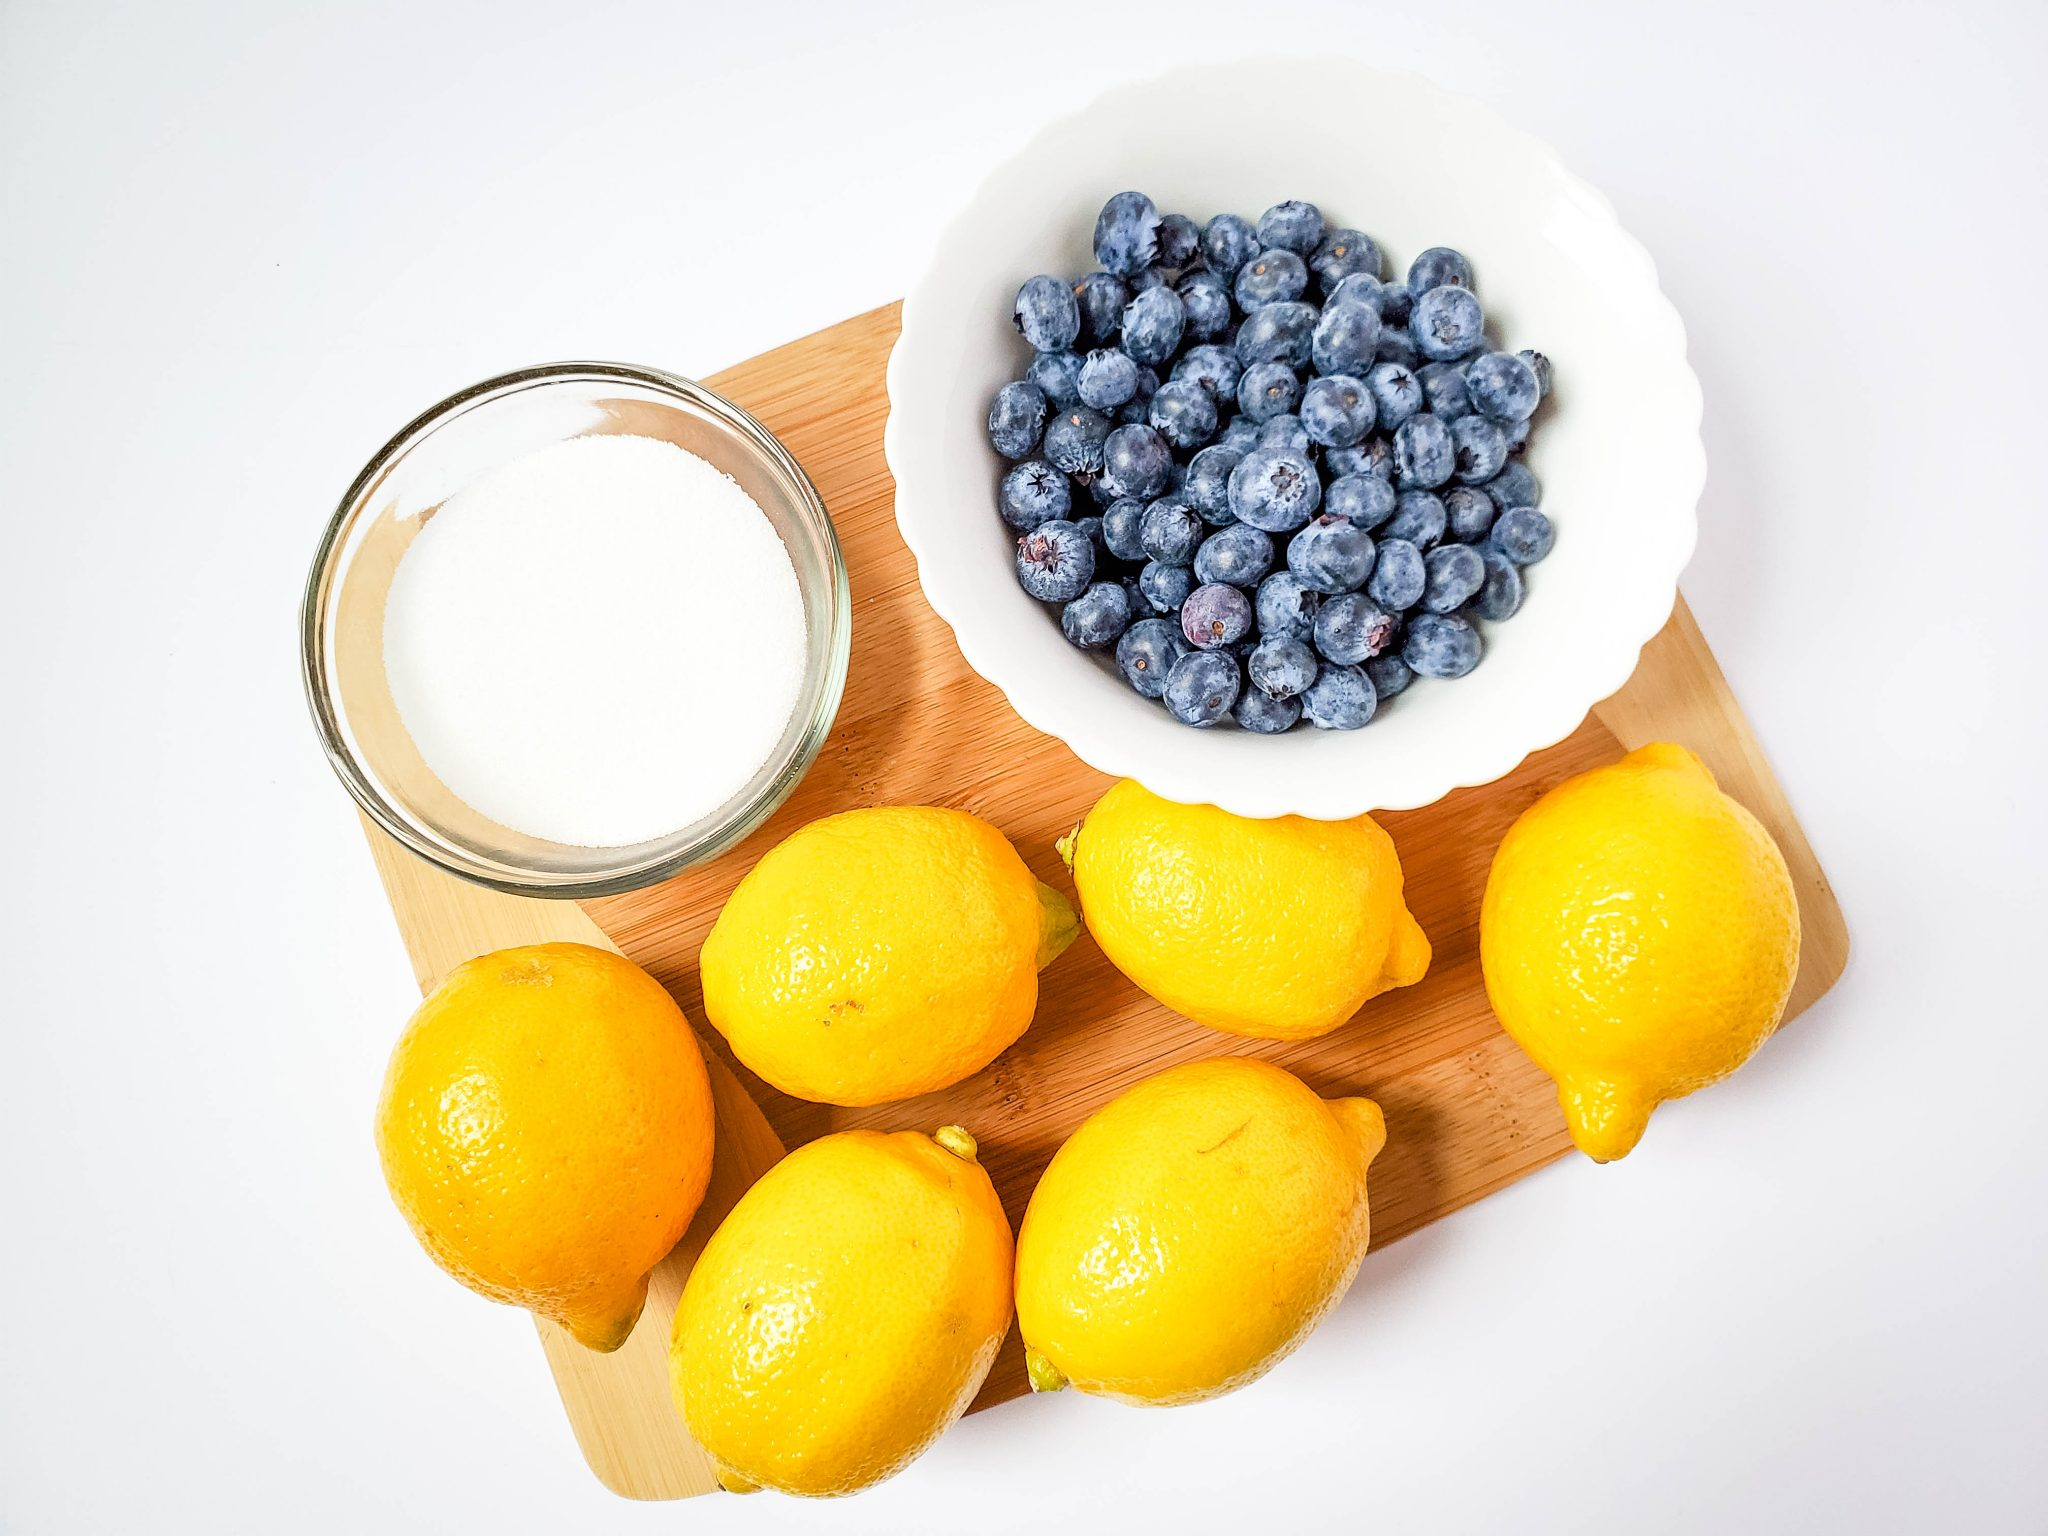 Sugar, blueberries, lemons on a wooden cutting board